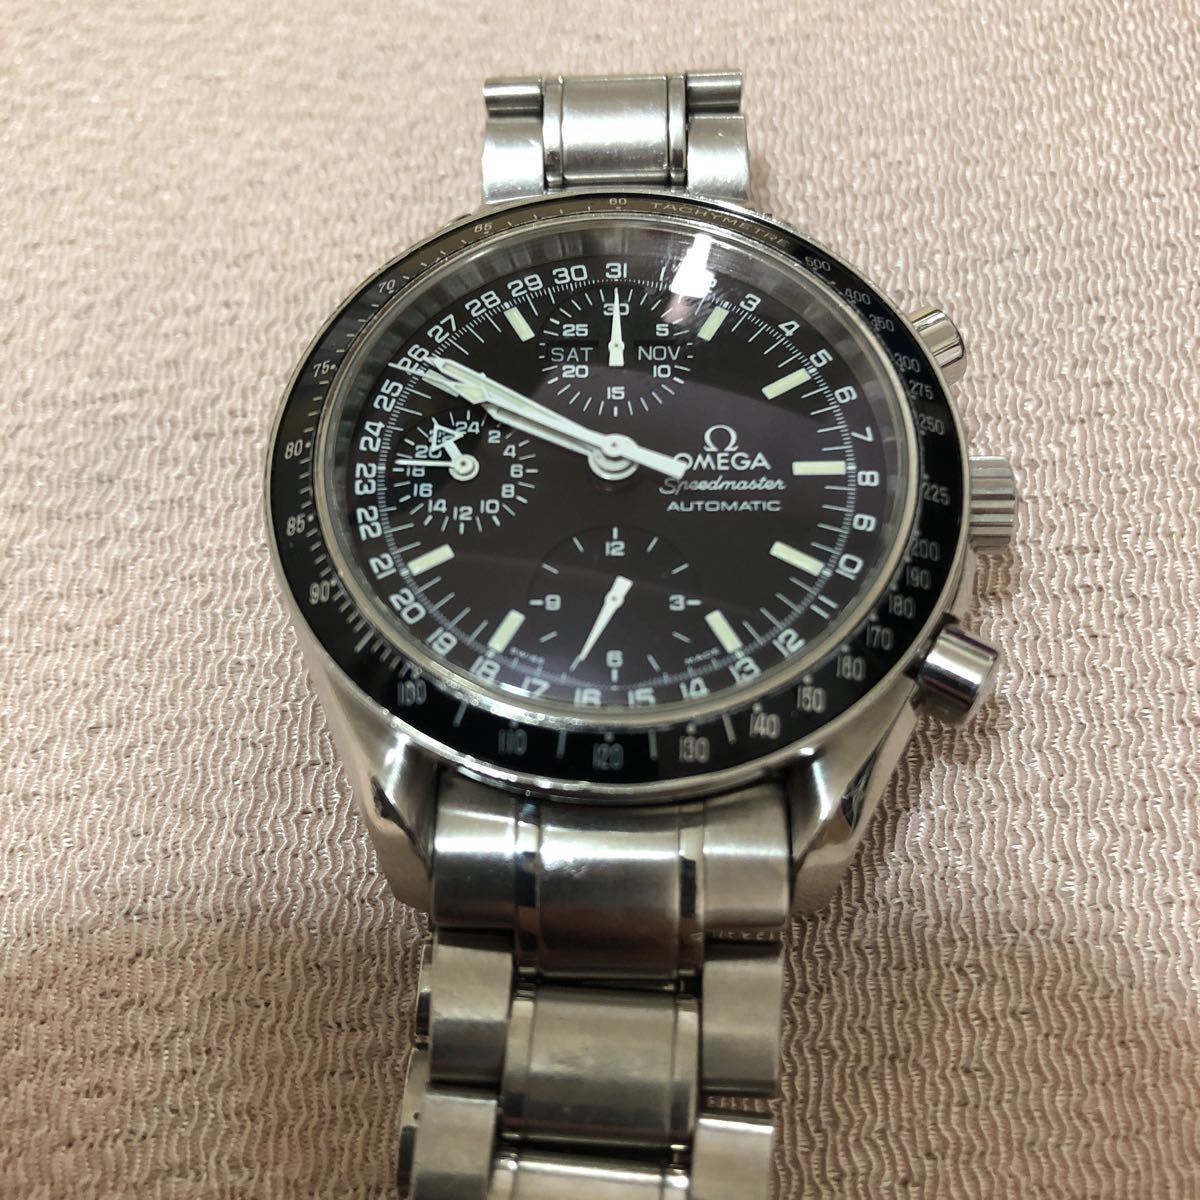 OMEGA オメガ スピードマスター マーク40 コスモス ブラック 自動巻き 腕時計 時計 正規品_画像3